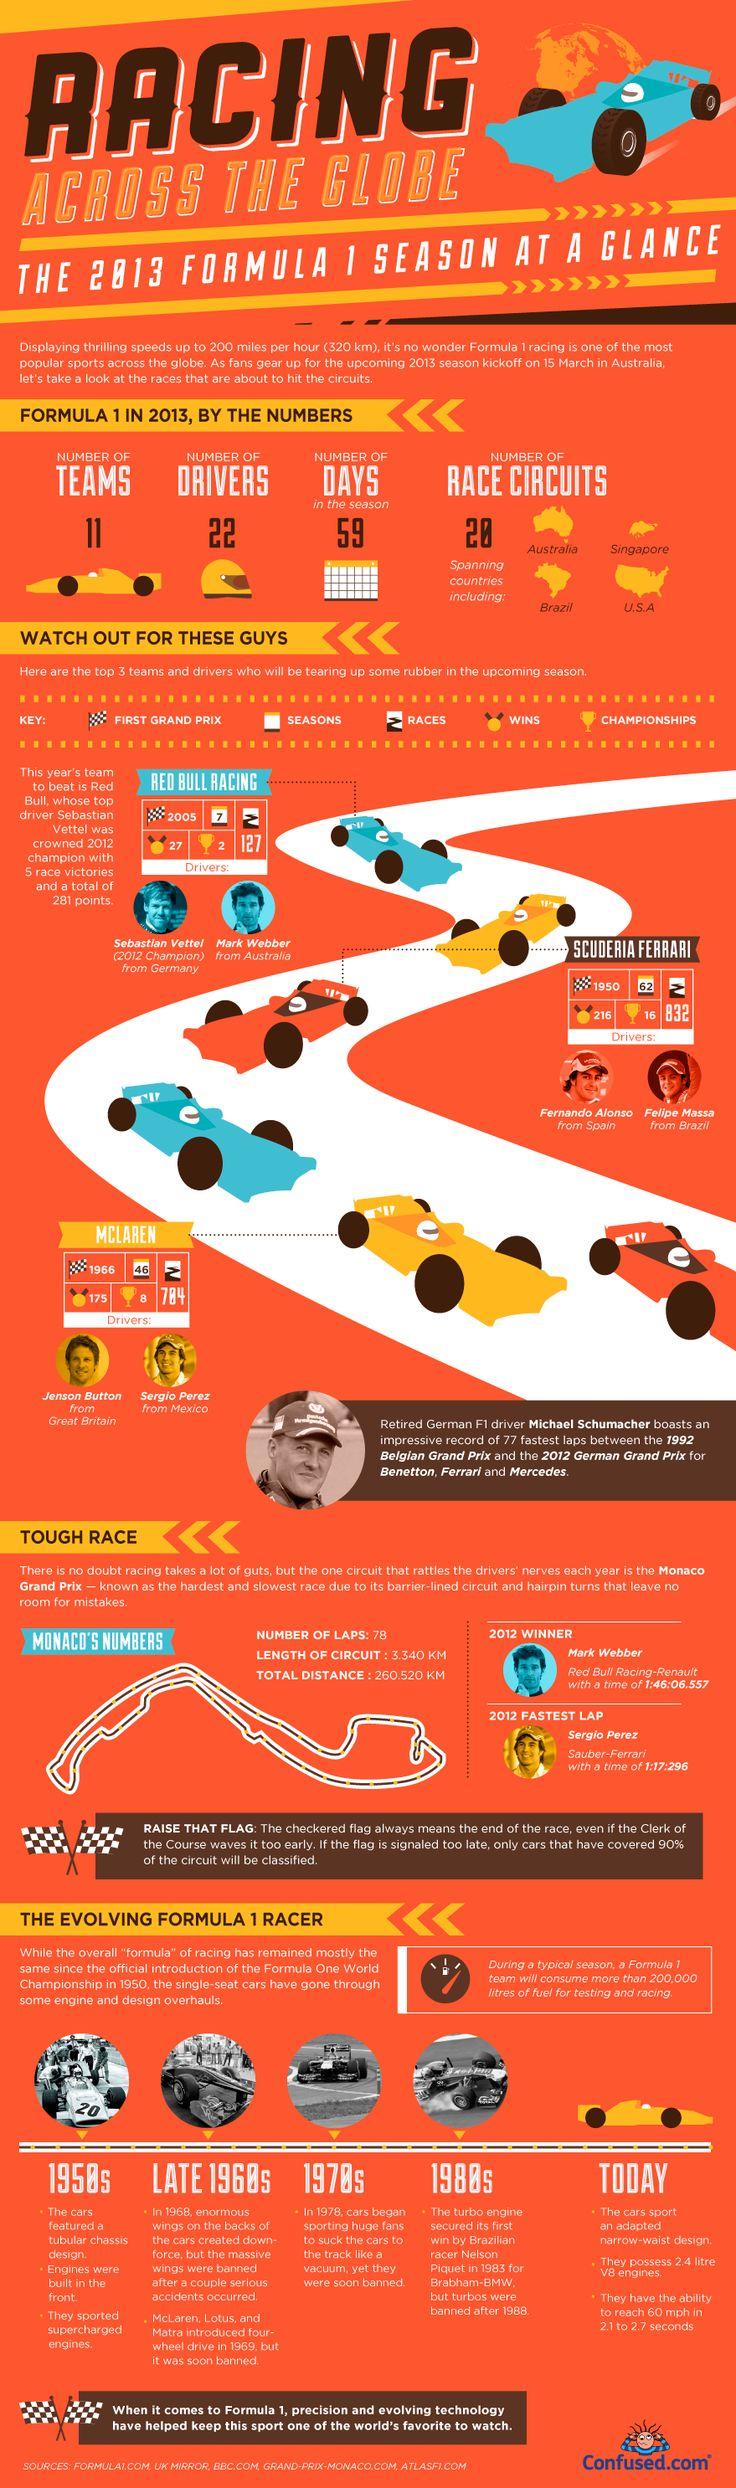 Formula 1 2013 season at a glance.